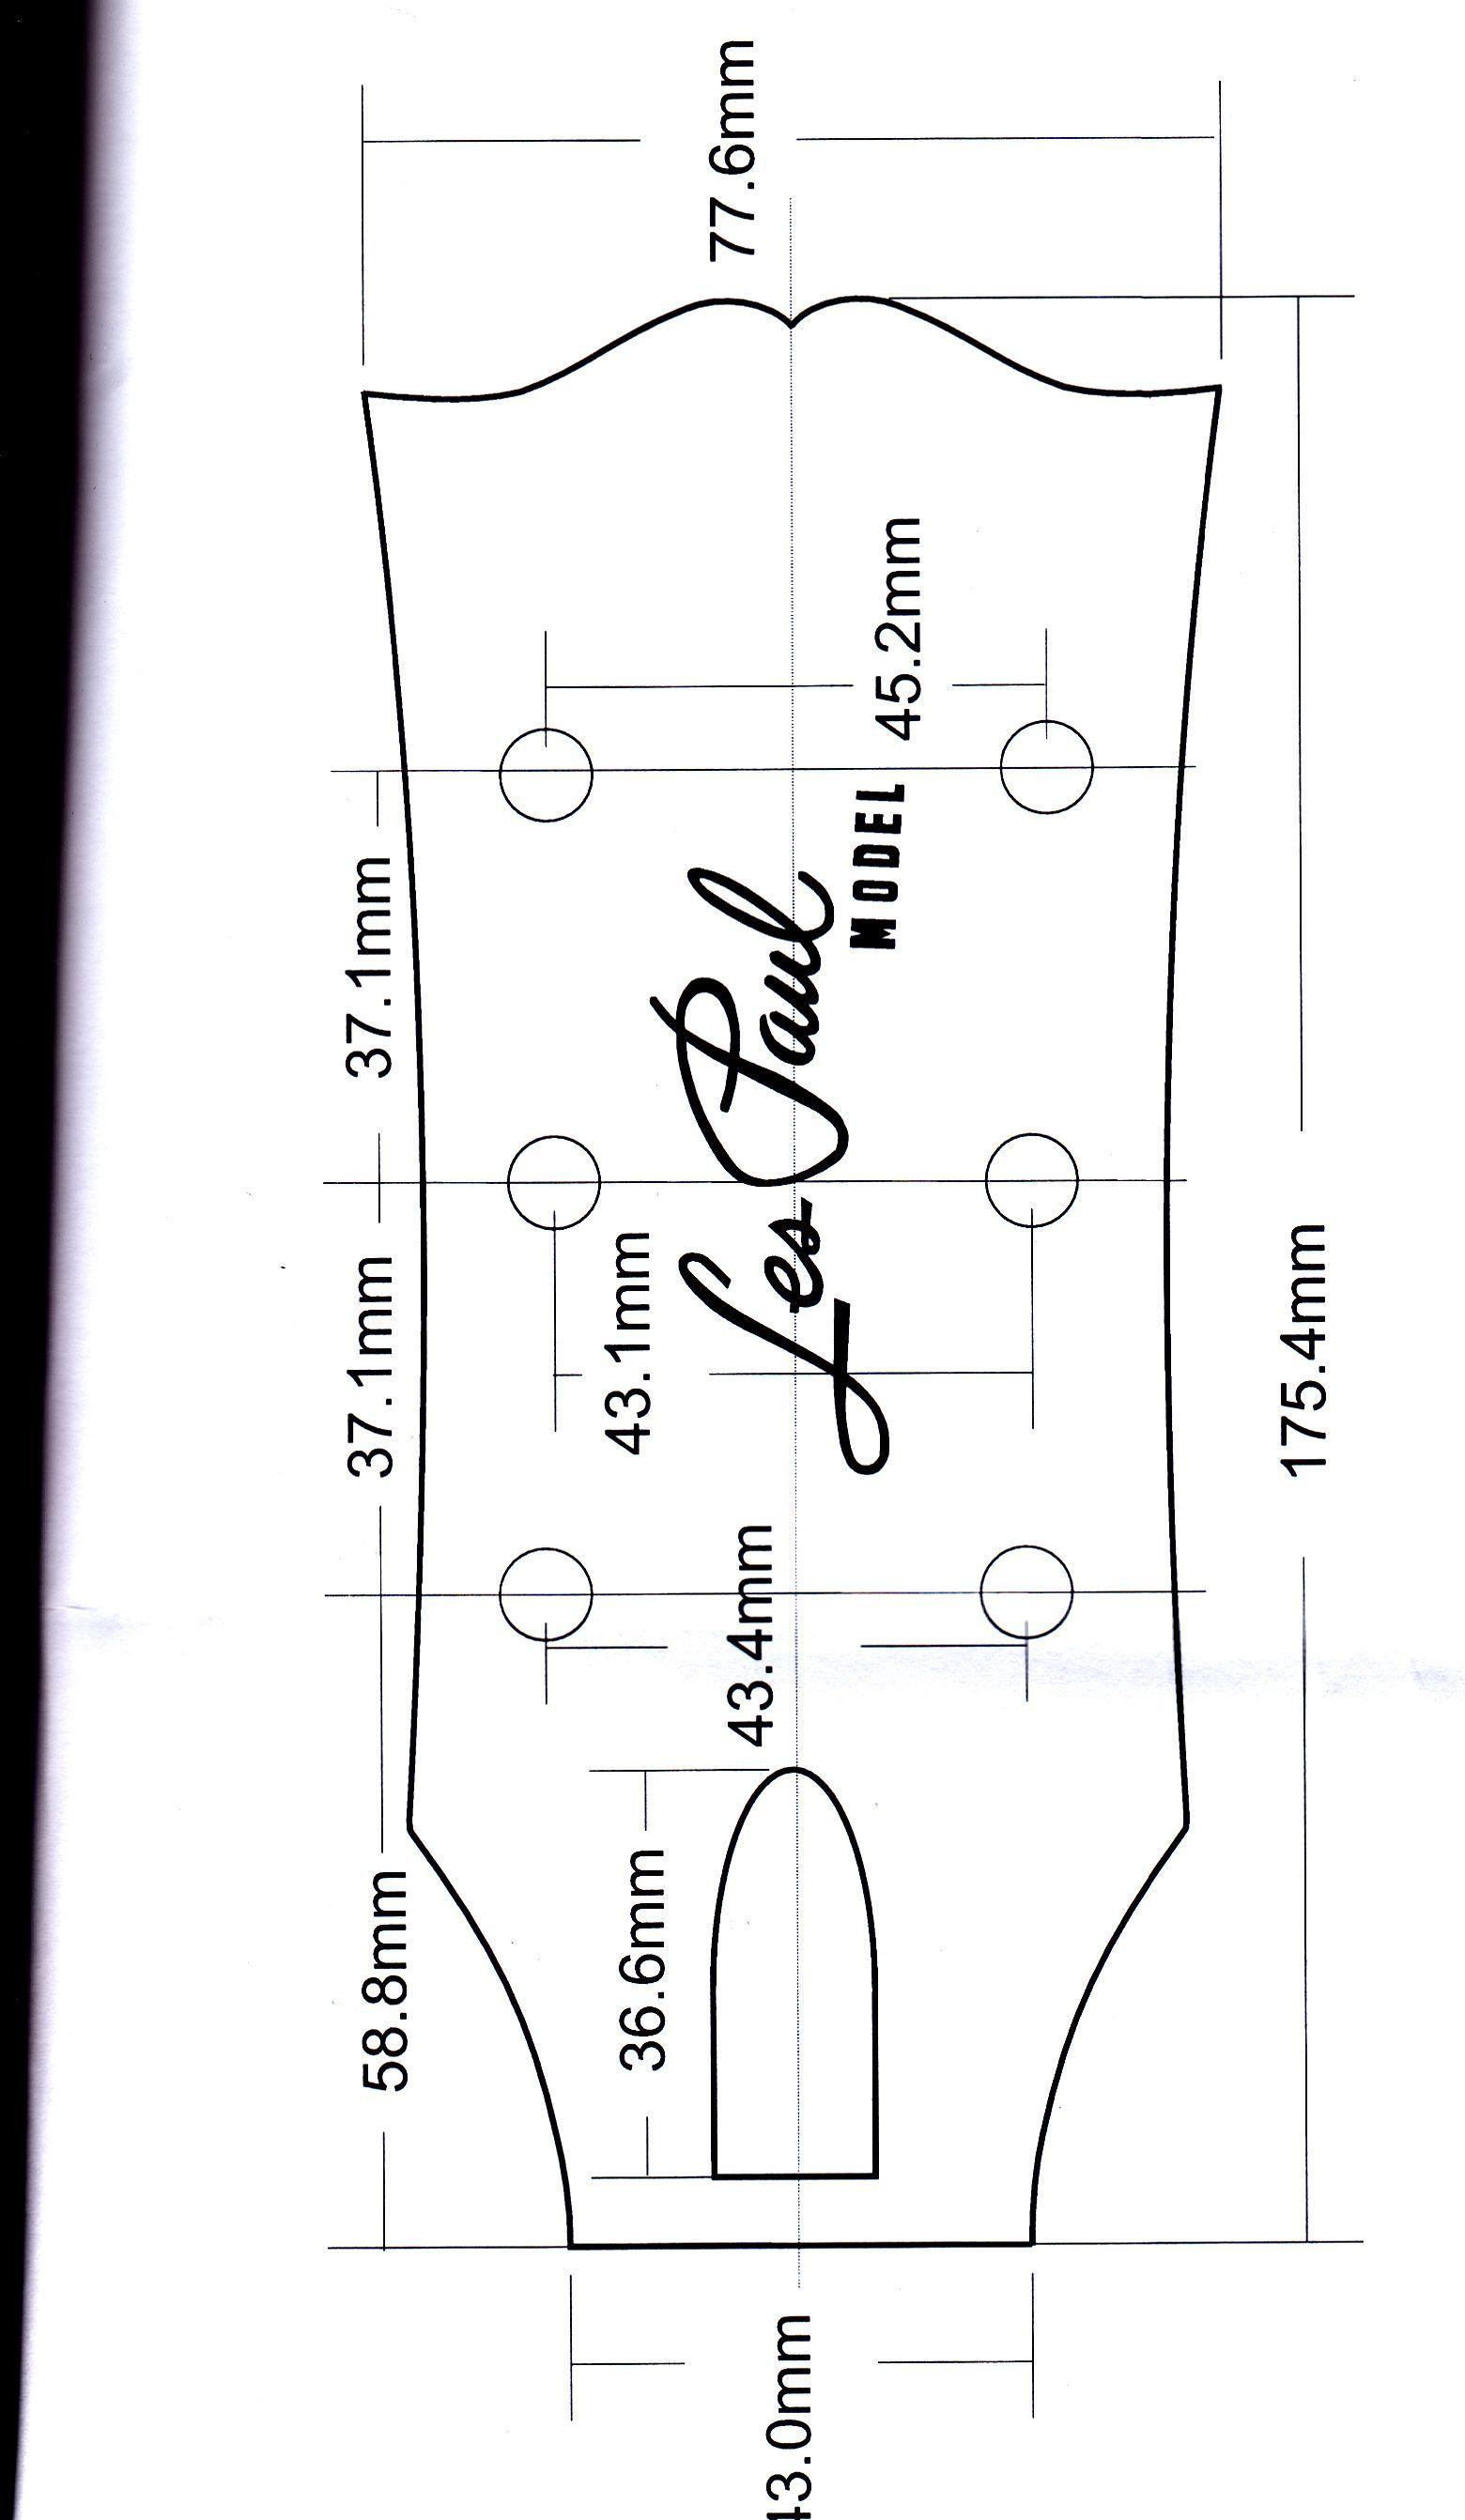 hight resolution of guitar amp music guitar acoustic guitar gibson acoustic guitar design ukulele